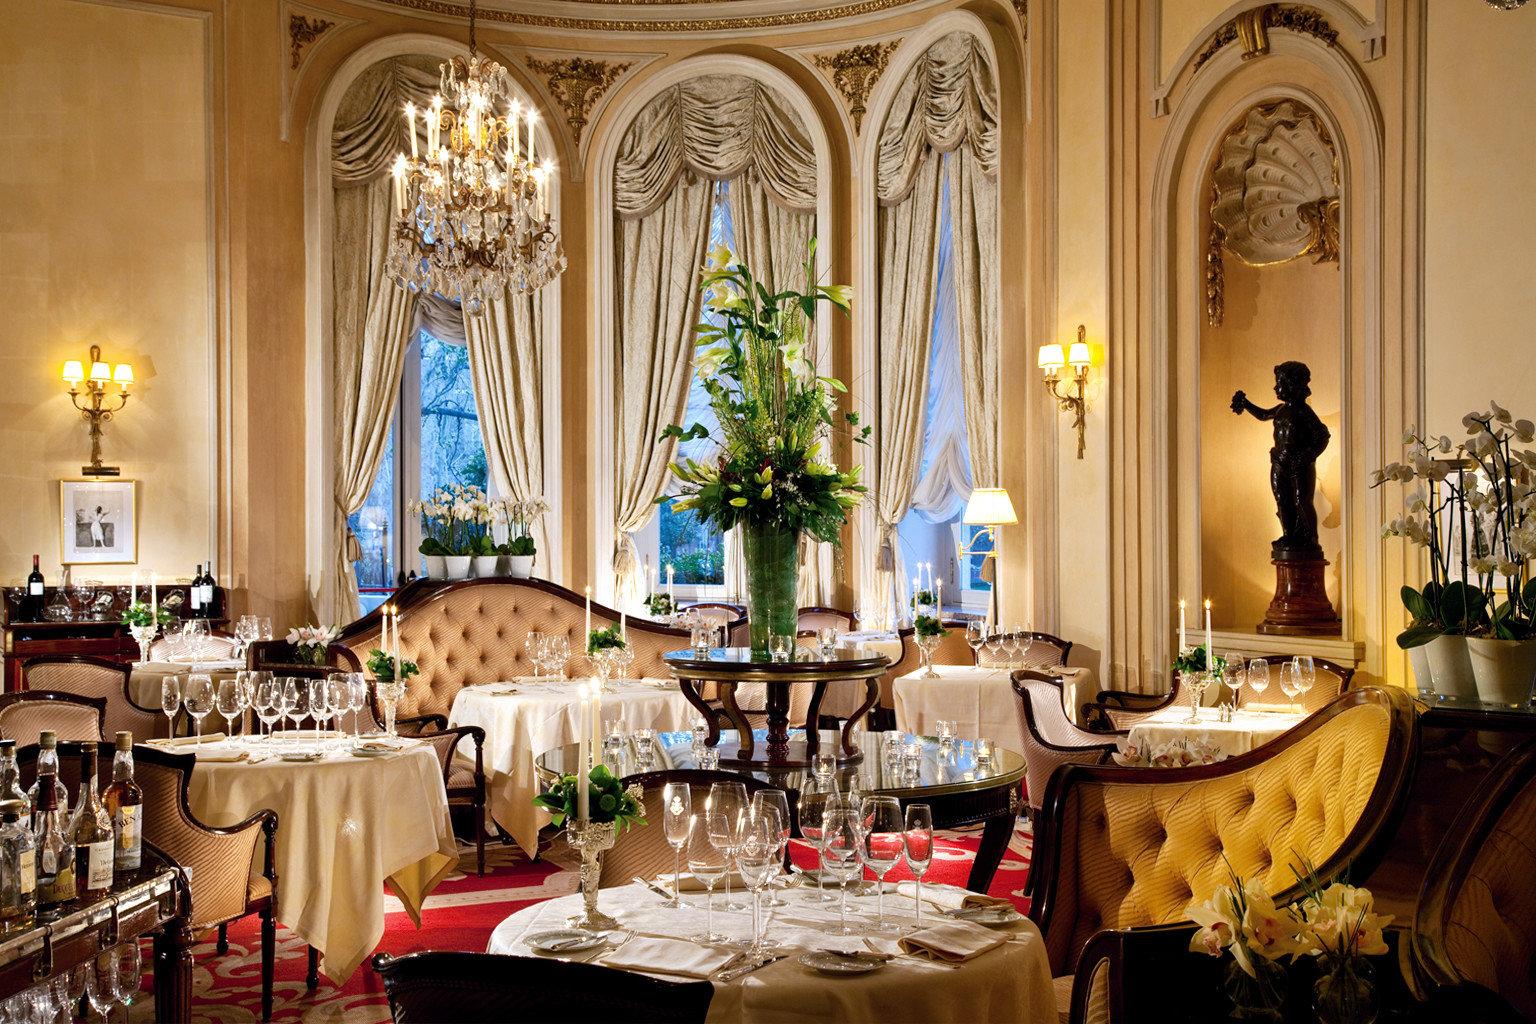 Bar Dining Drink Eat Elegant Historic Hotels Madrid Spain function hall ceremony ballroom palace fancy